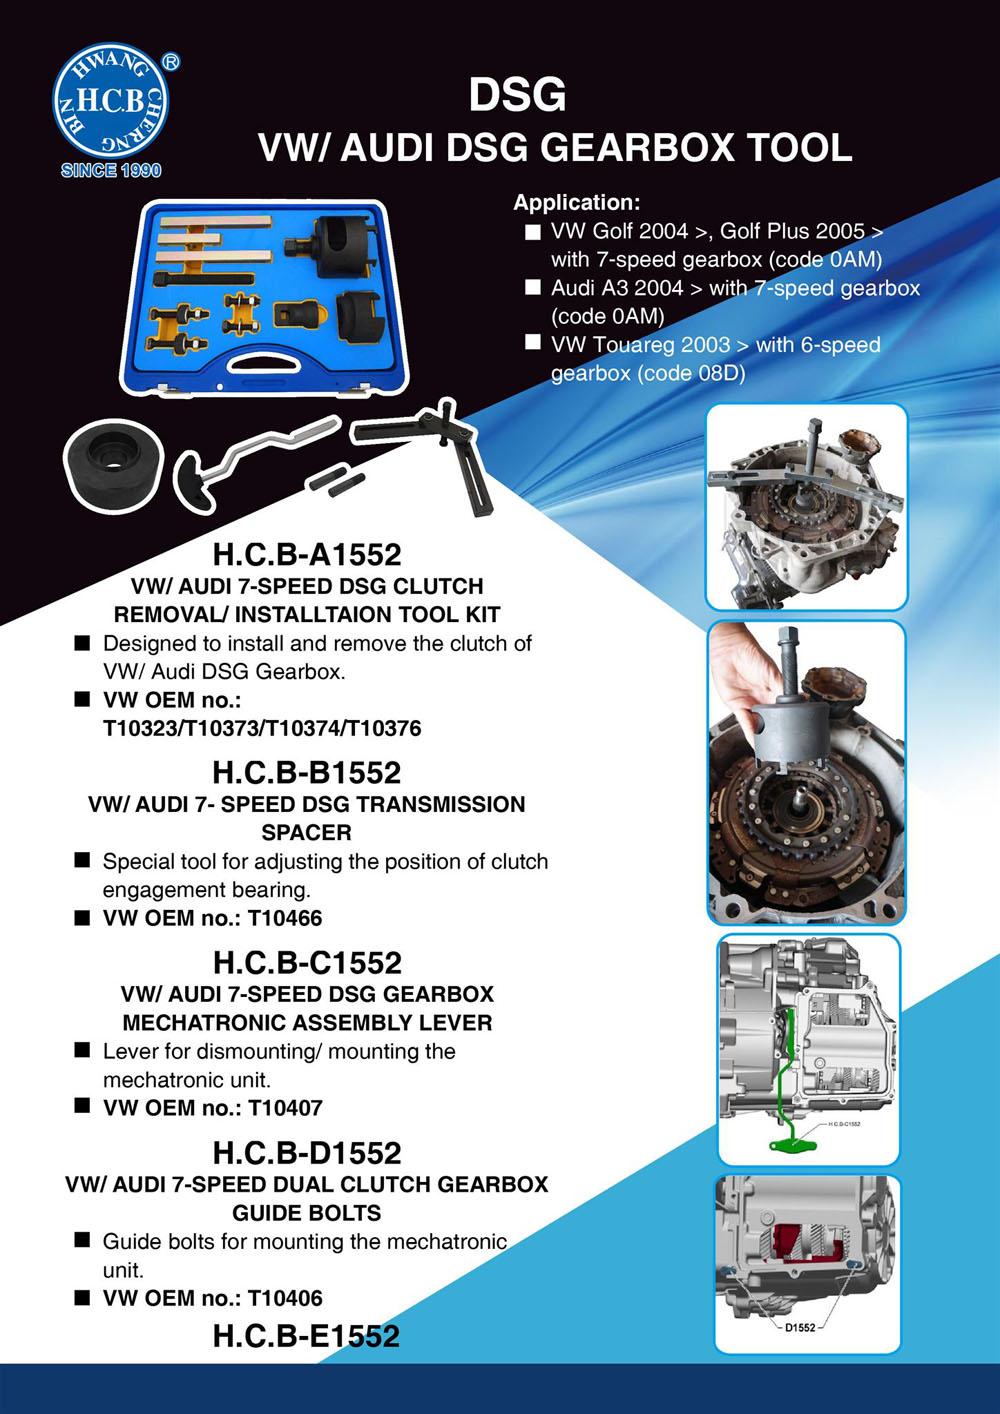 hcb-dsg_vw_audi_dsg_gearbox_tool.jpg